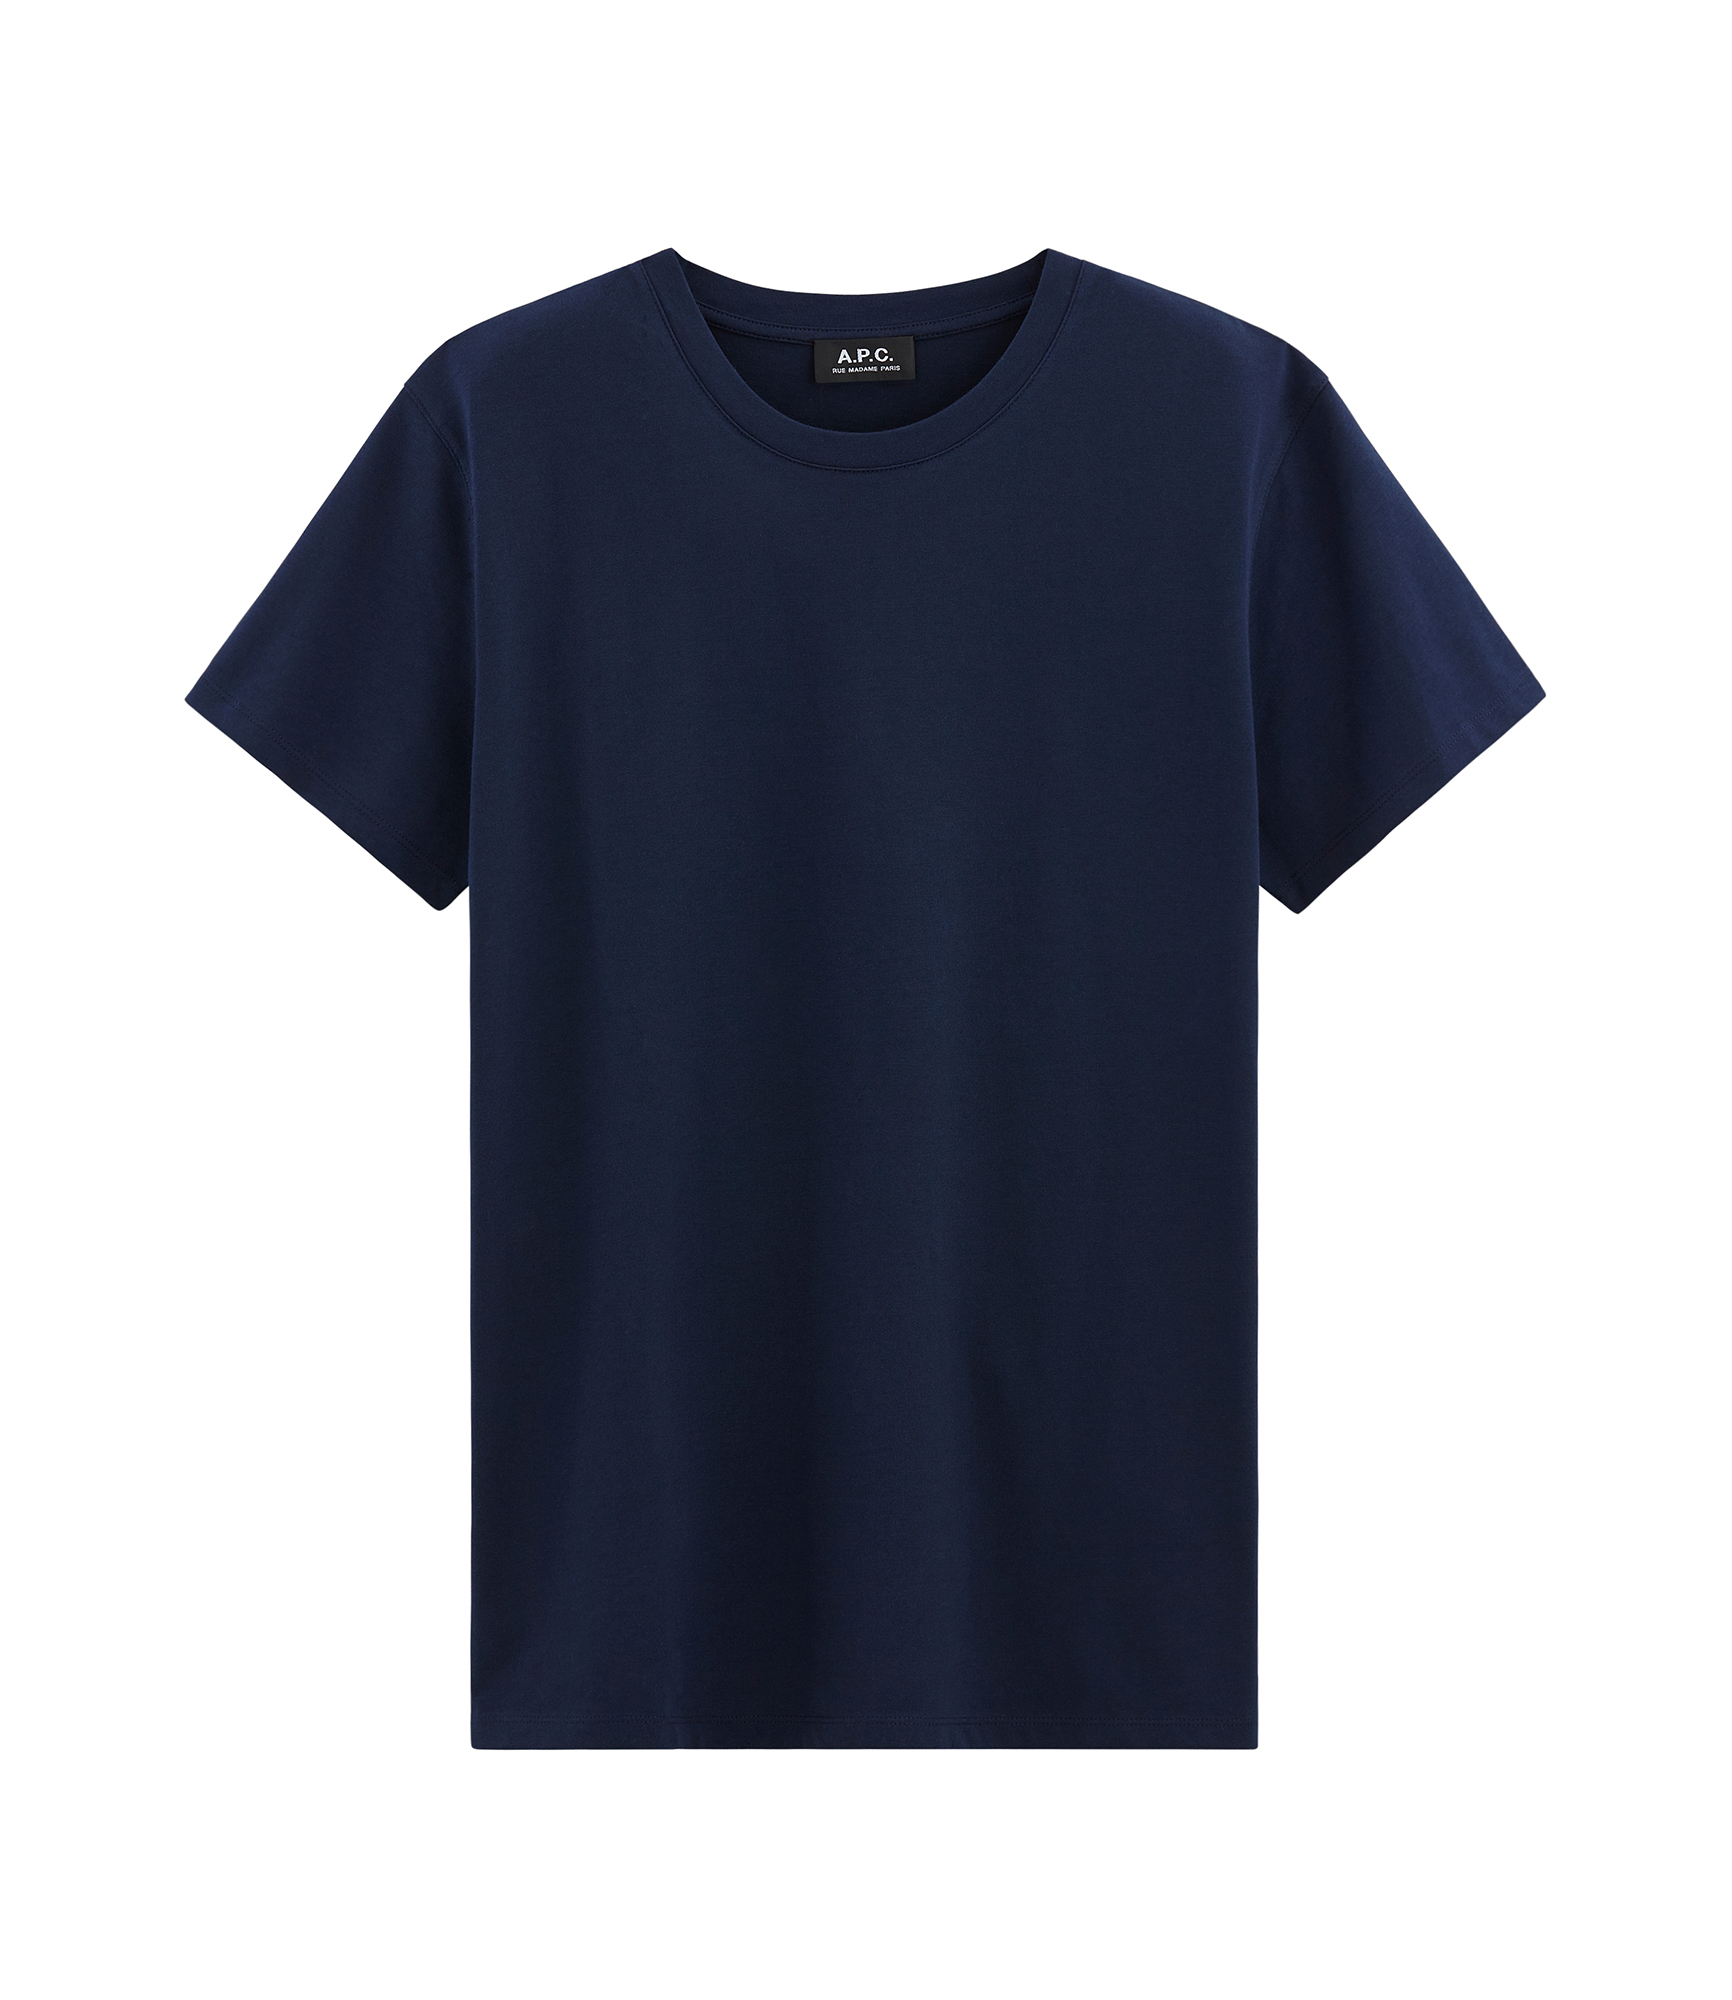 c shirt T A Jimmy p dxroeBCW